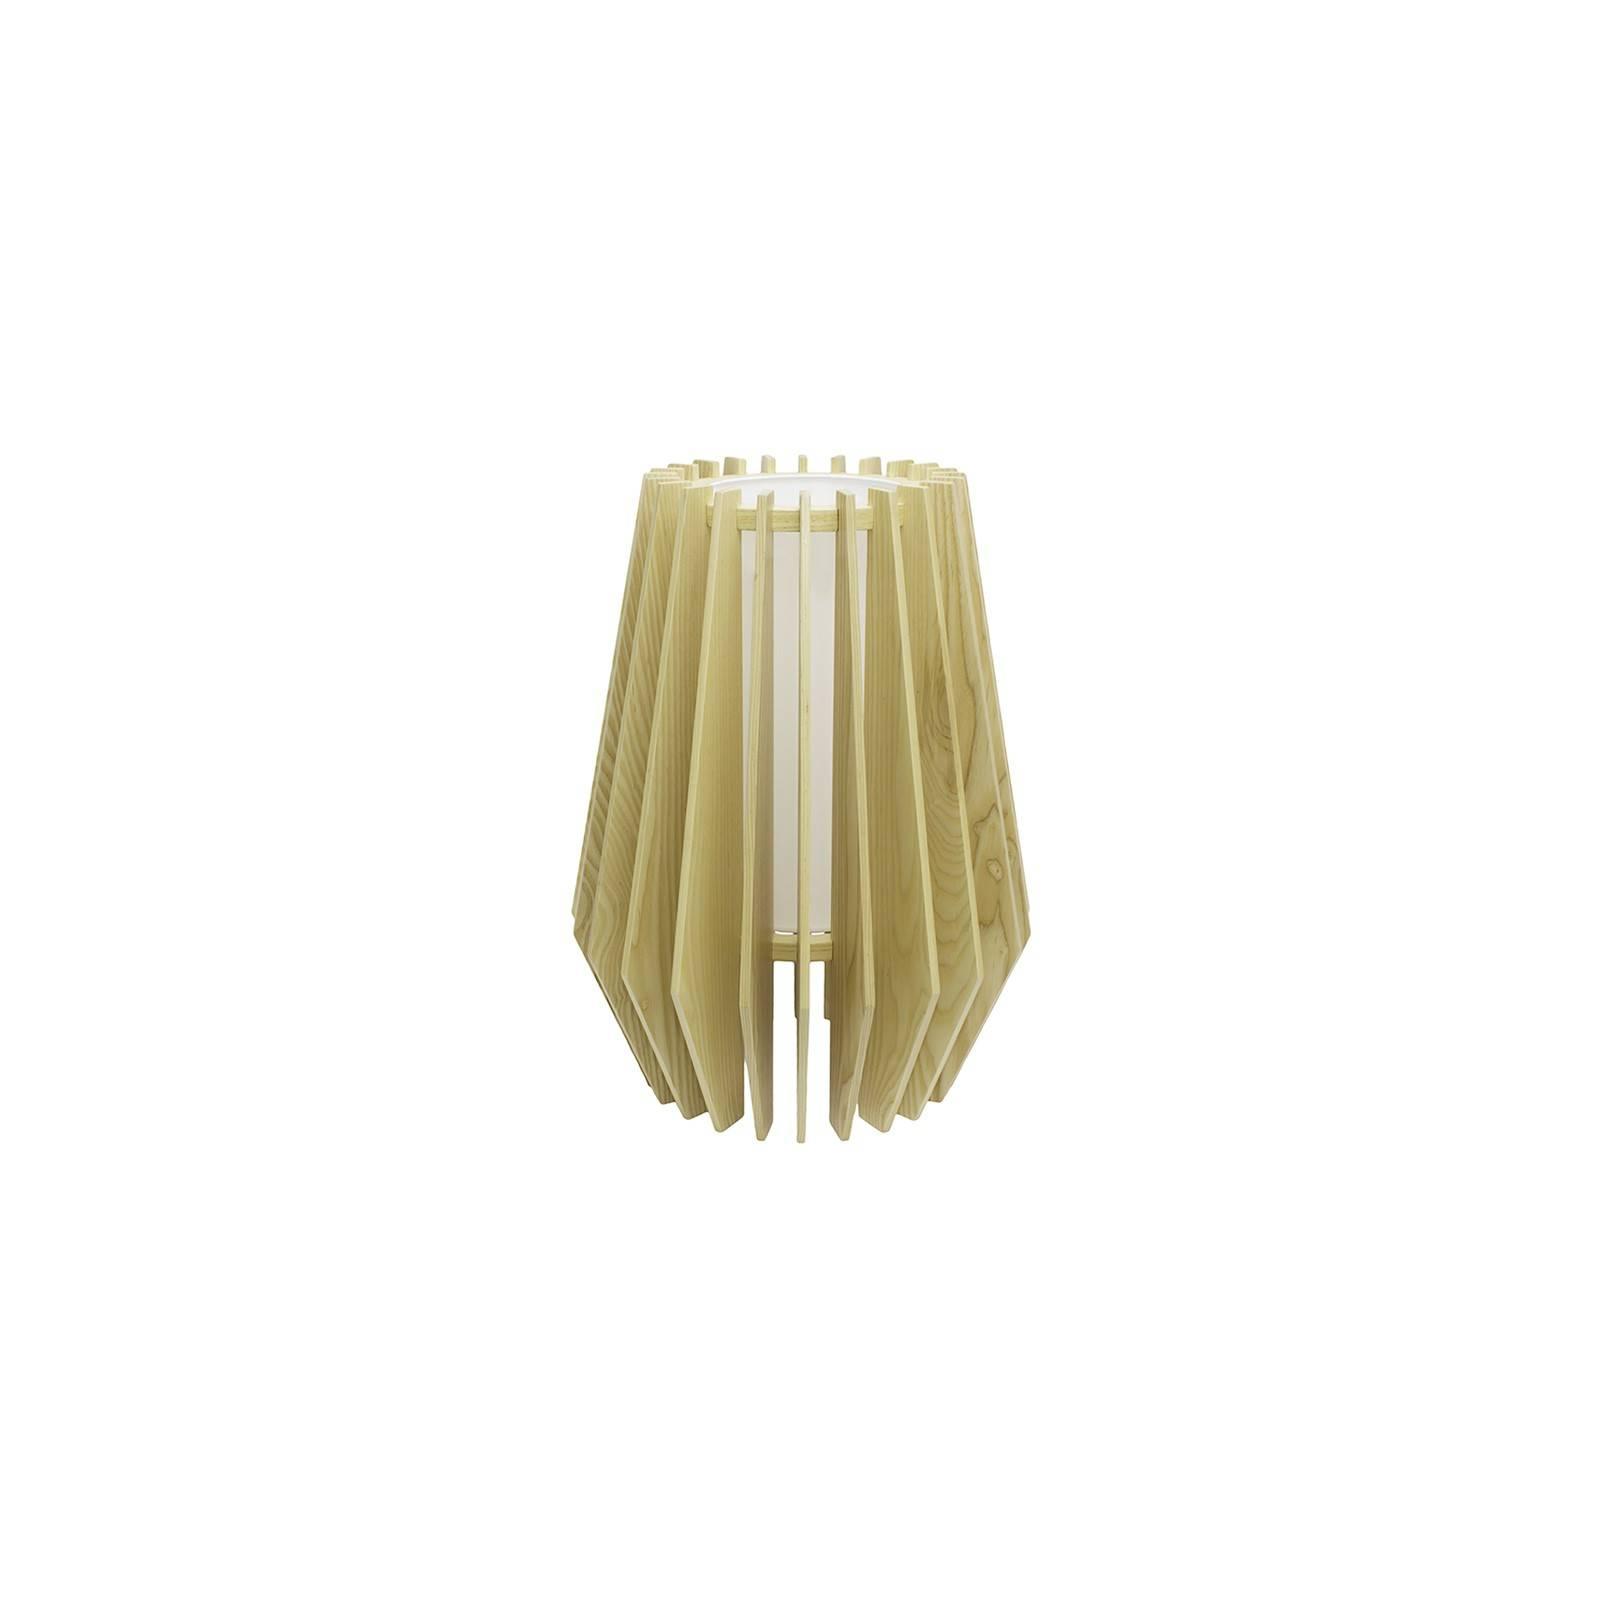 Grande lampe nature Trope au style design